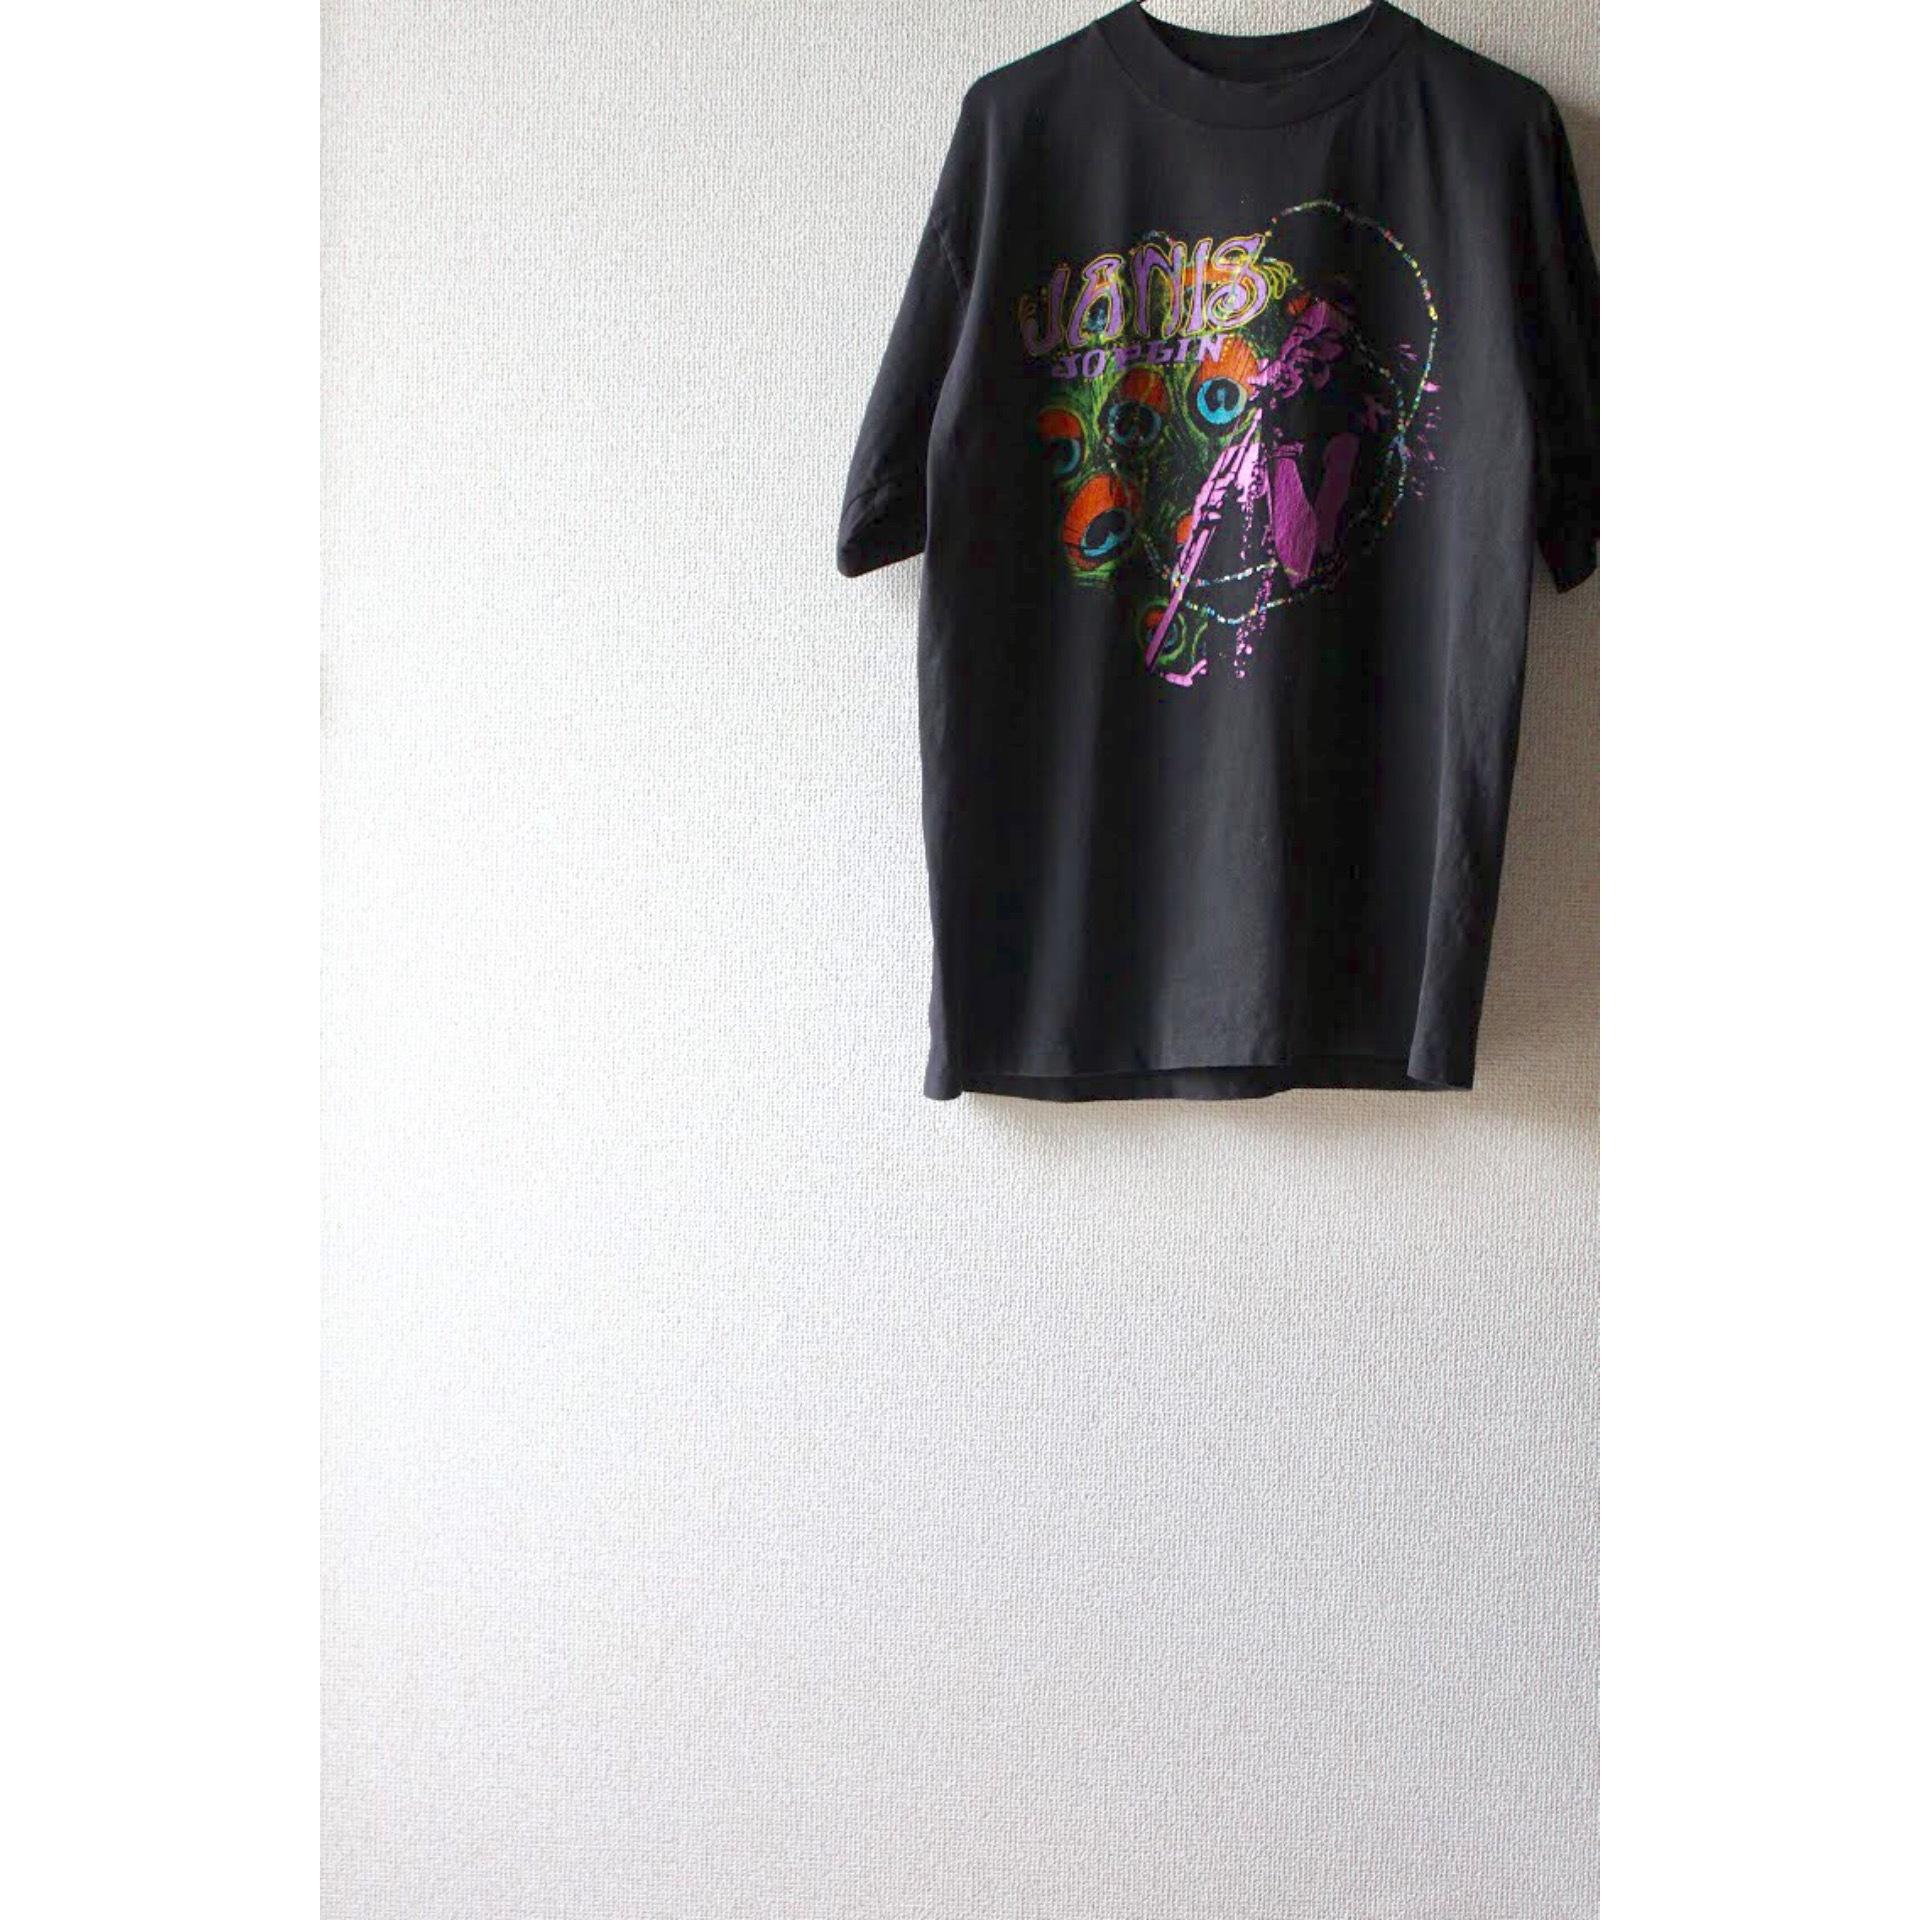 Vintage Janis Joplin t shirt